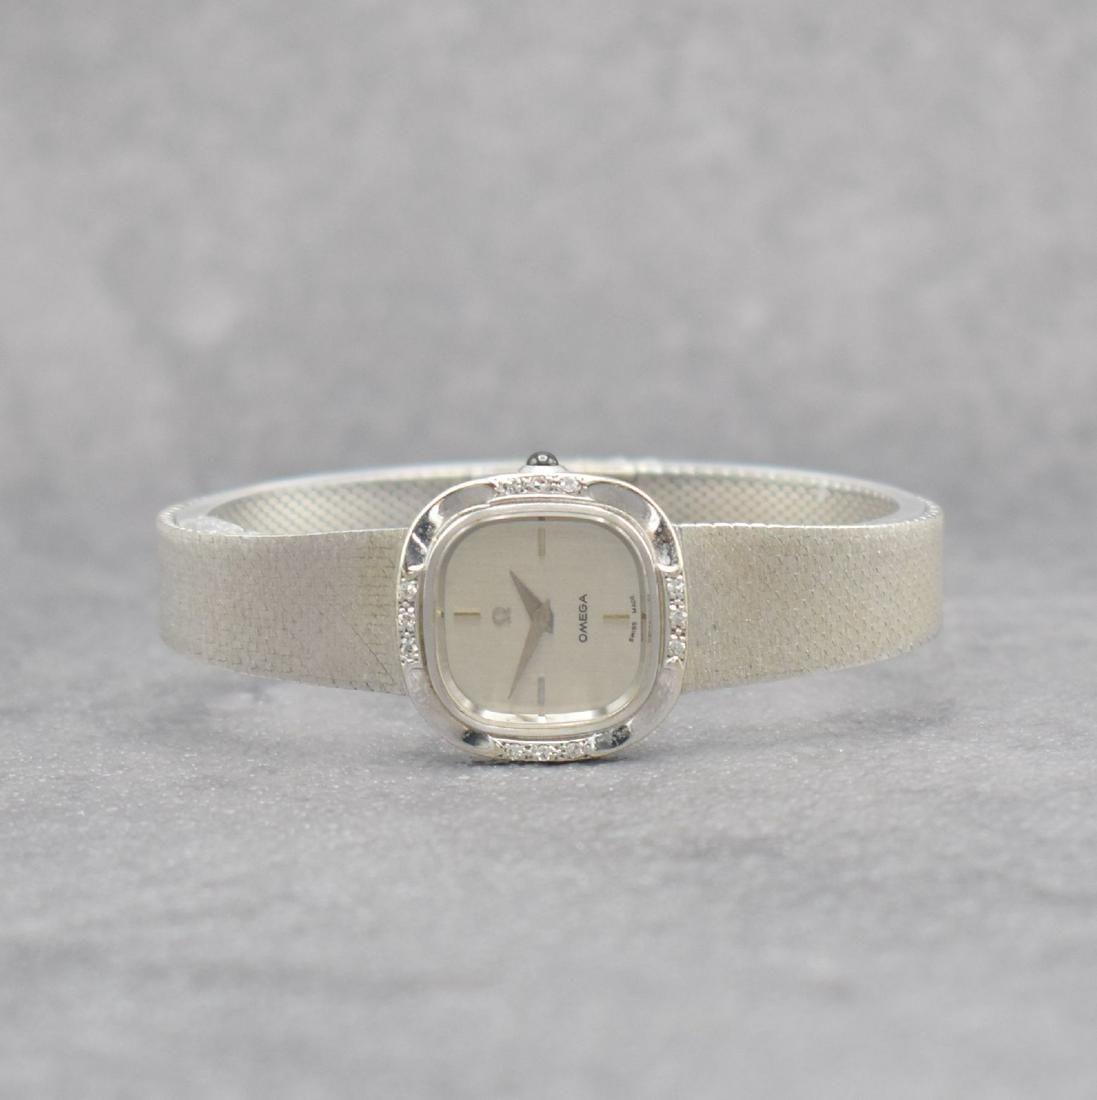 OMEGA 14k white gold ladies wristwatch